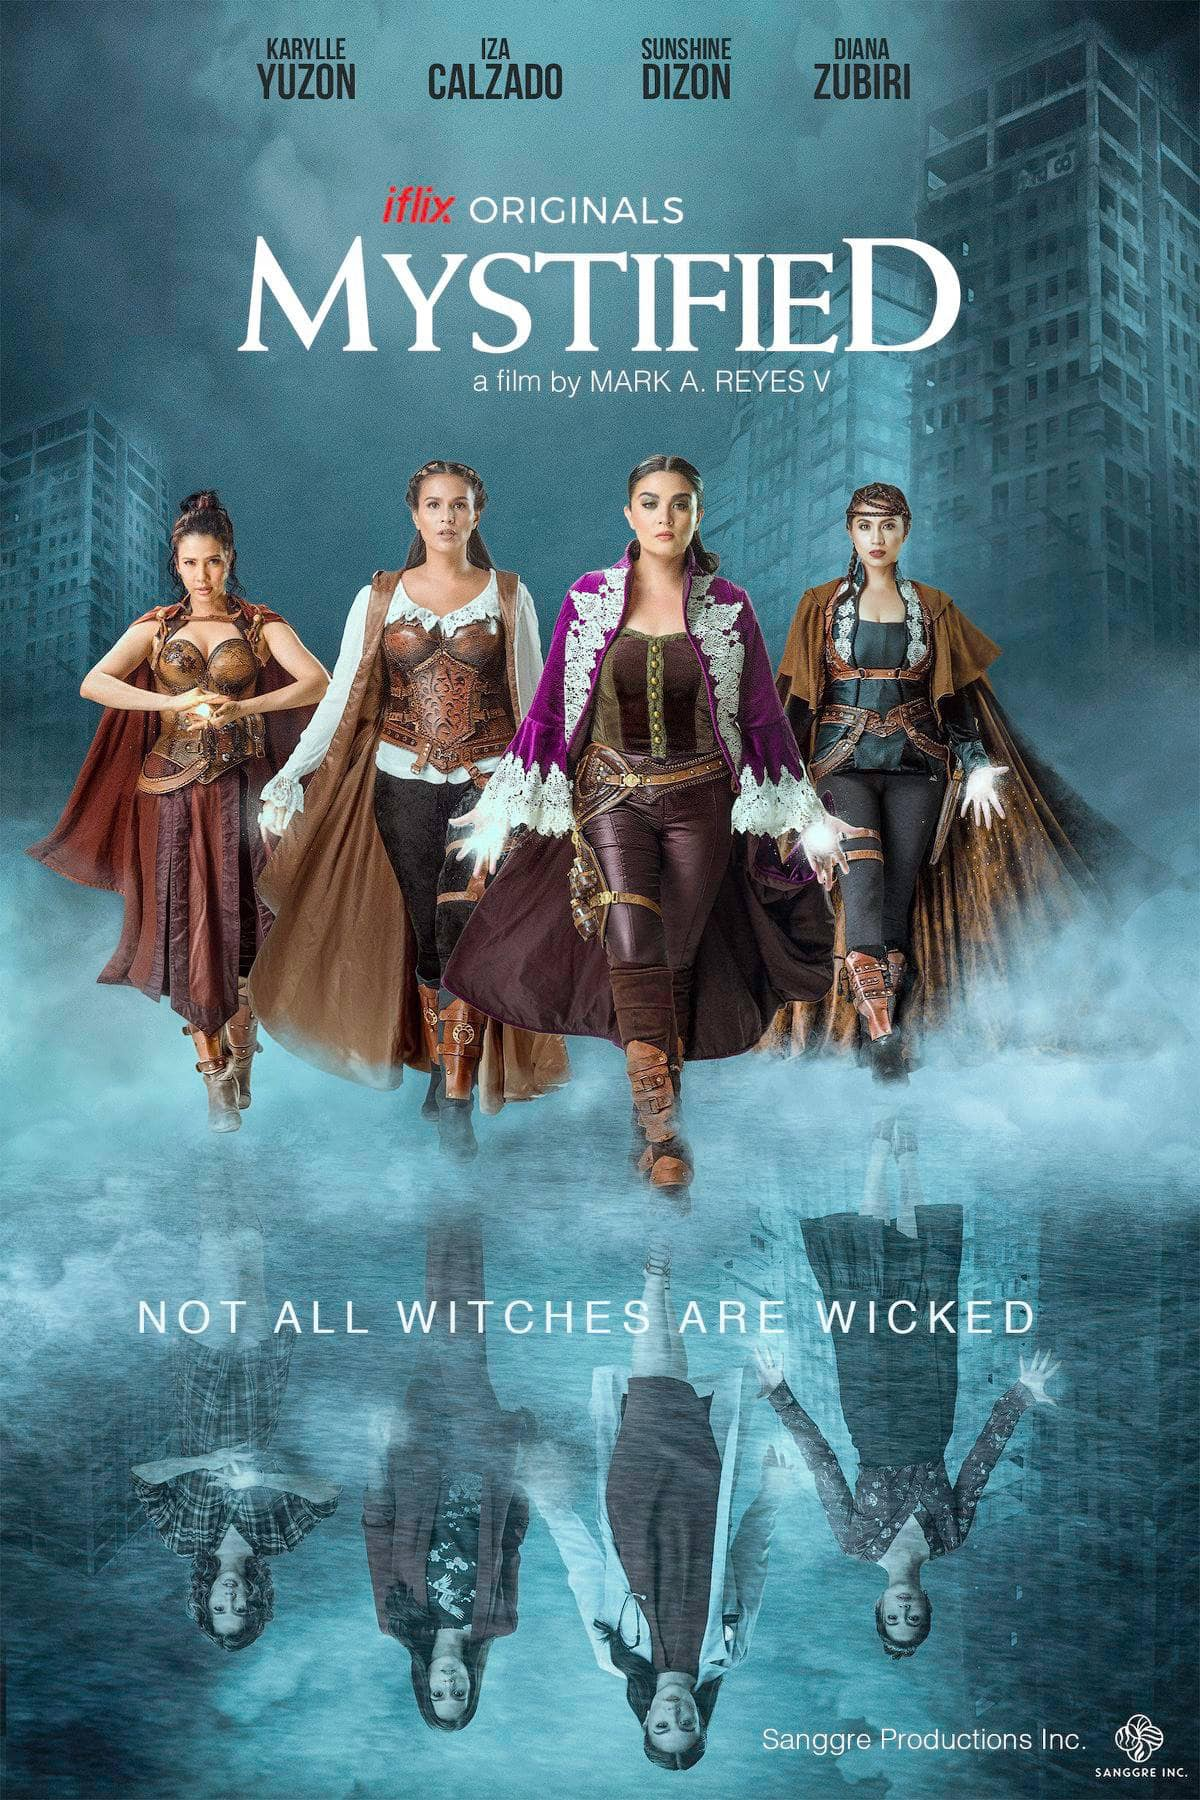 Sunshine Dizon, Diana Zubiri, Karylle, and Iza Calzado in Mystified (2019)